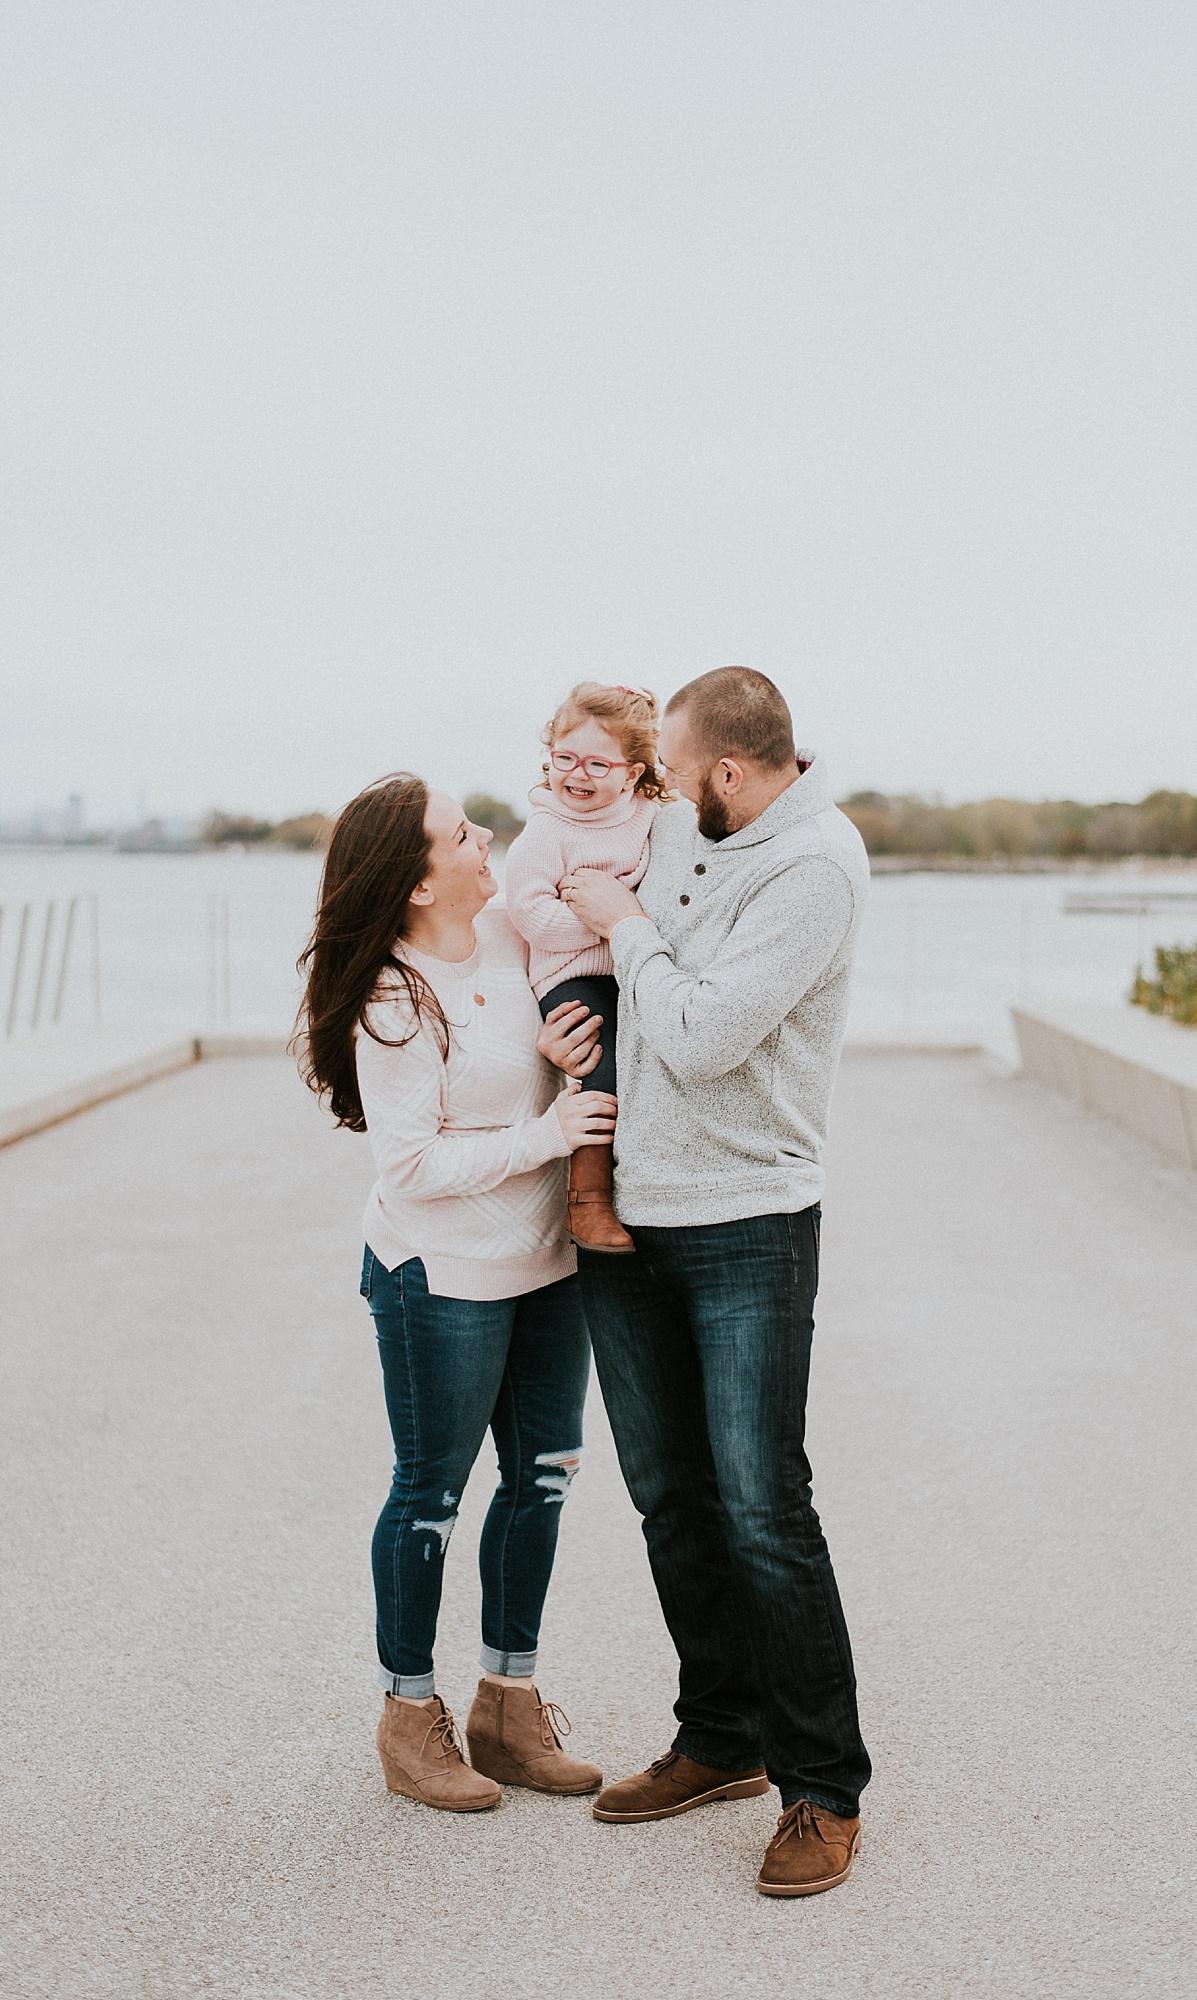 CHICAGO-MATERNITY-FAMILY-PHOTOGRAPHER-LISH-MARIE_0384.jpg